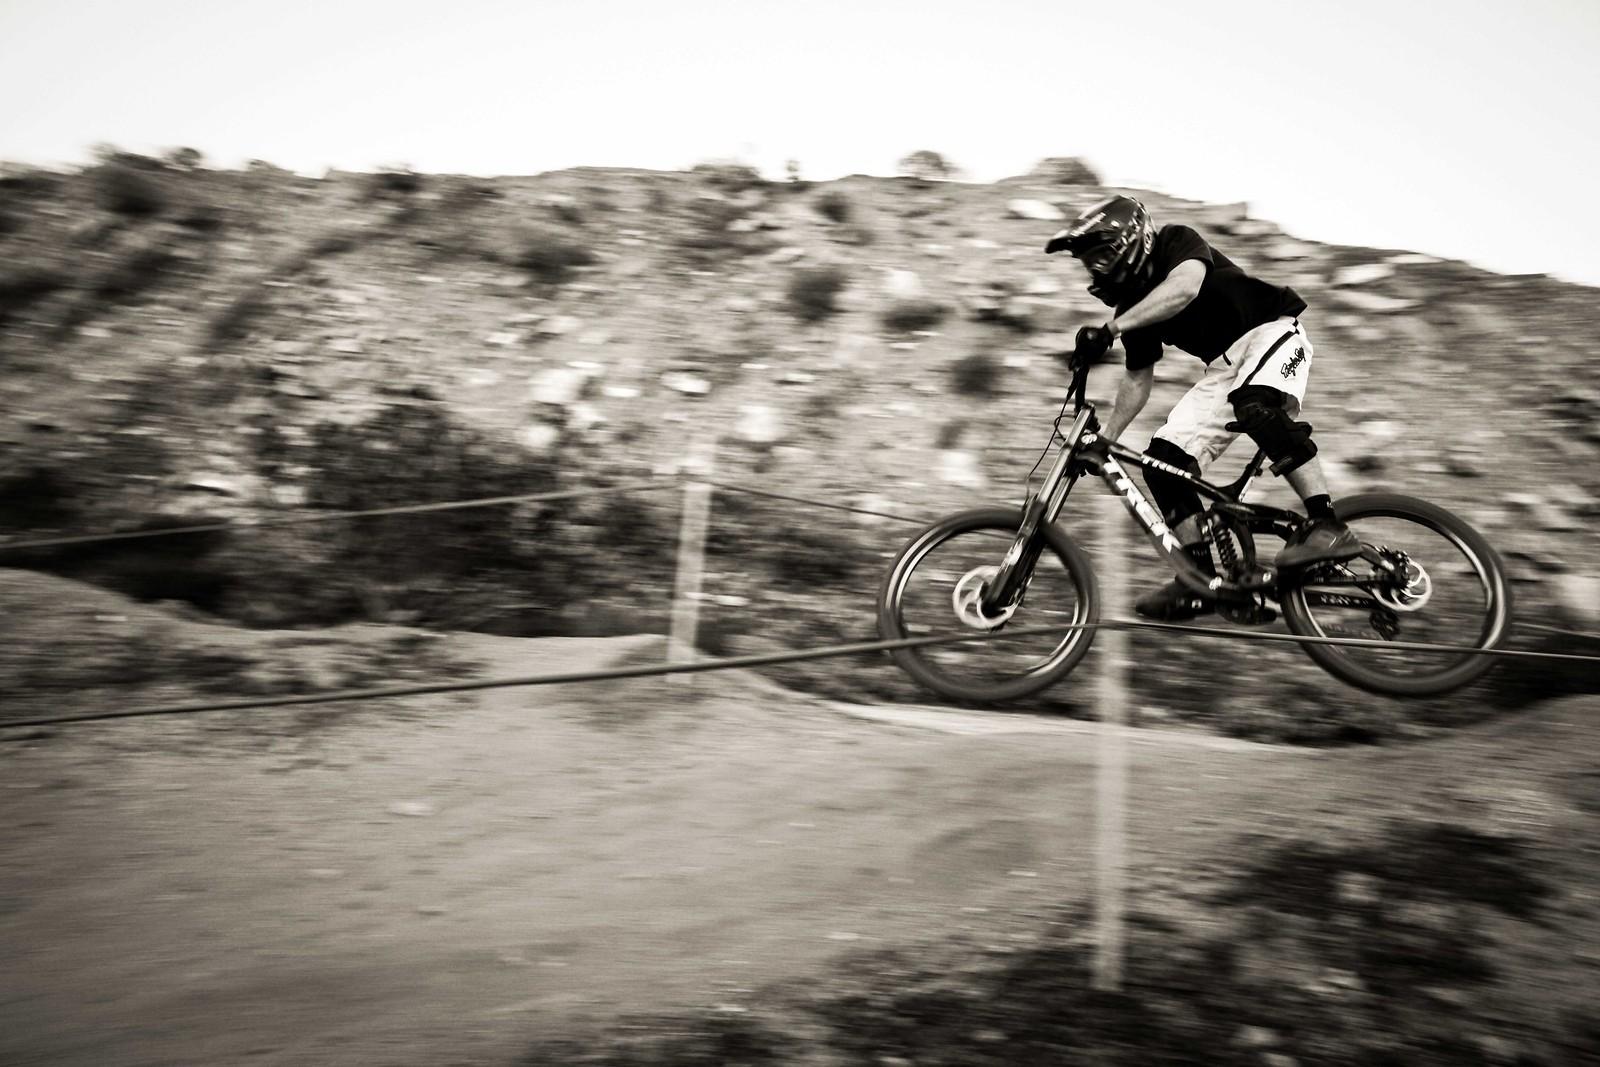 Whip - GnarHuck - Mountain Biking Pictures - Vital MTB